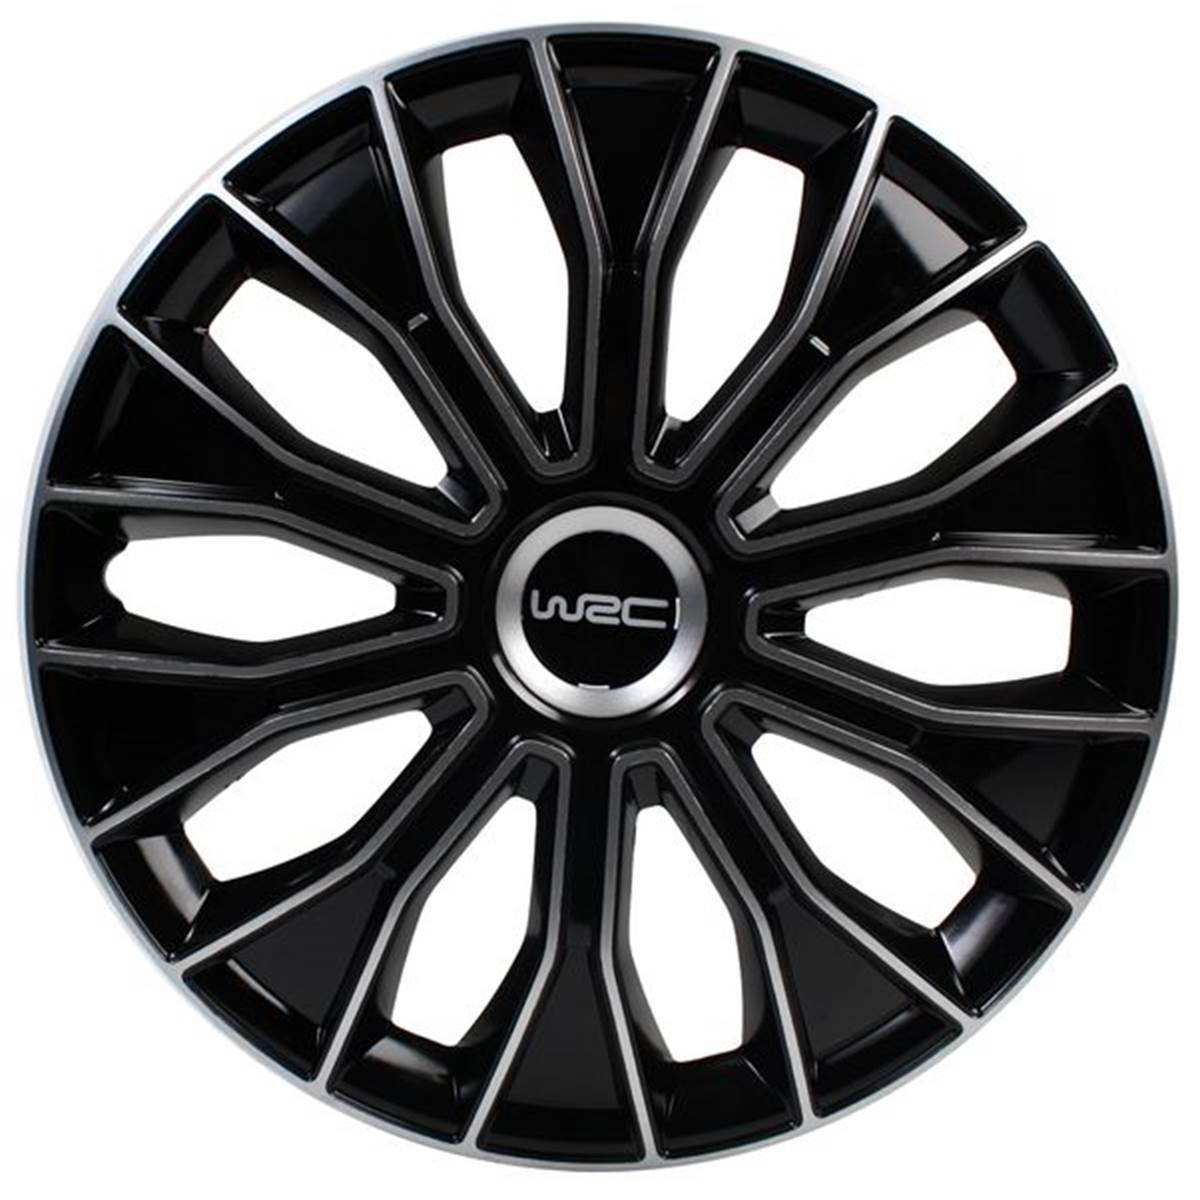 4 enjoliveurs WRC 13 N°15 Noir/Argent\